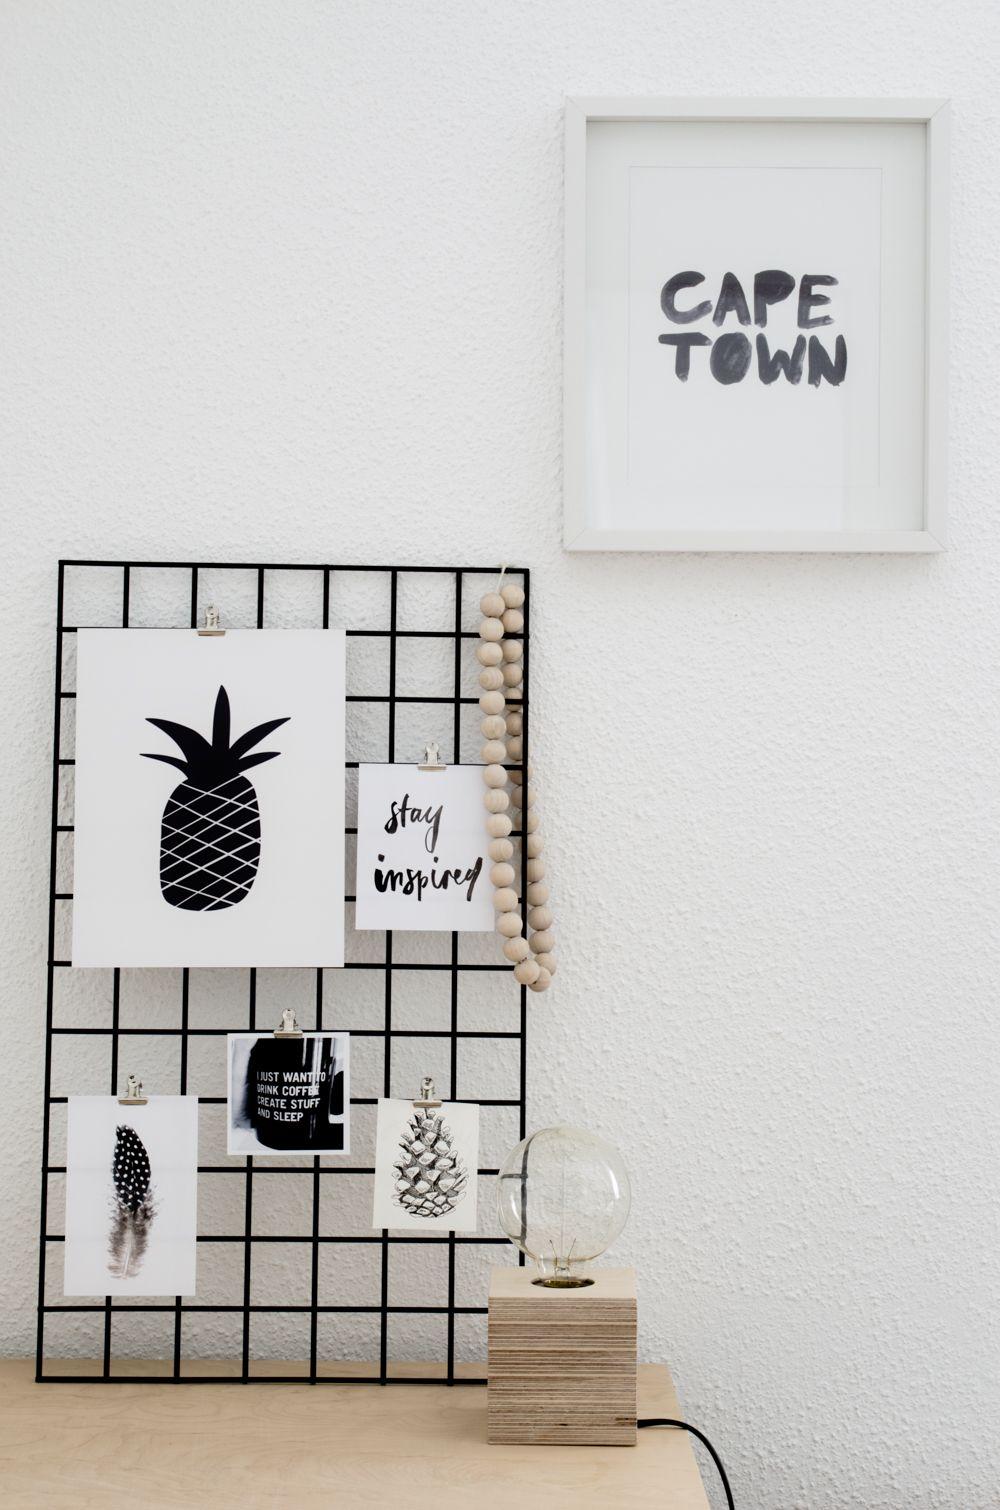 Wire Mesh Board | Wire mesh, Board and Scandinavian style